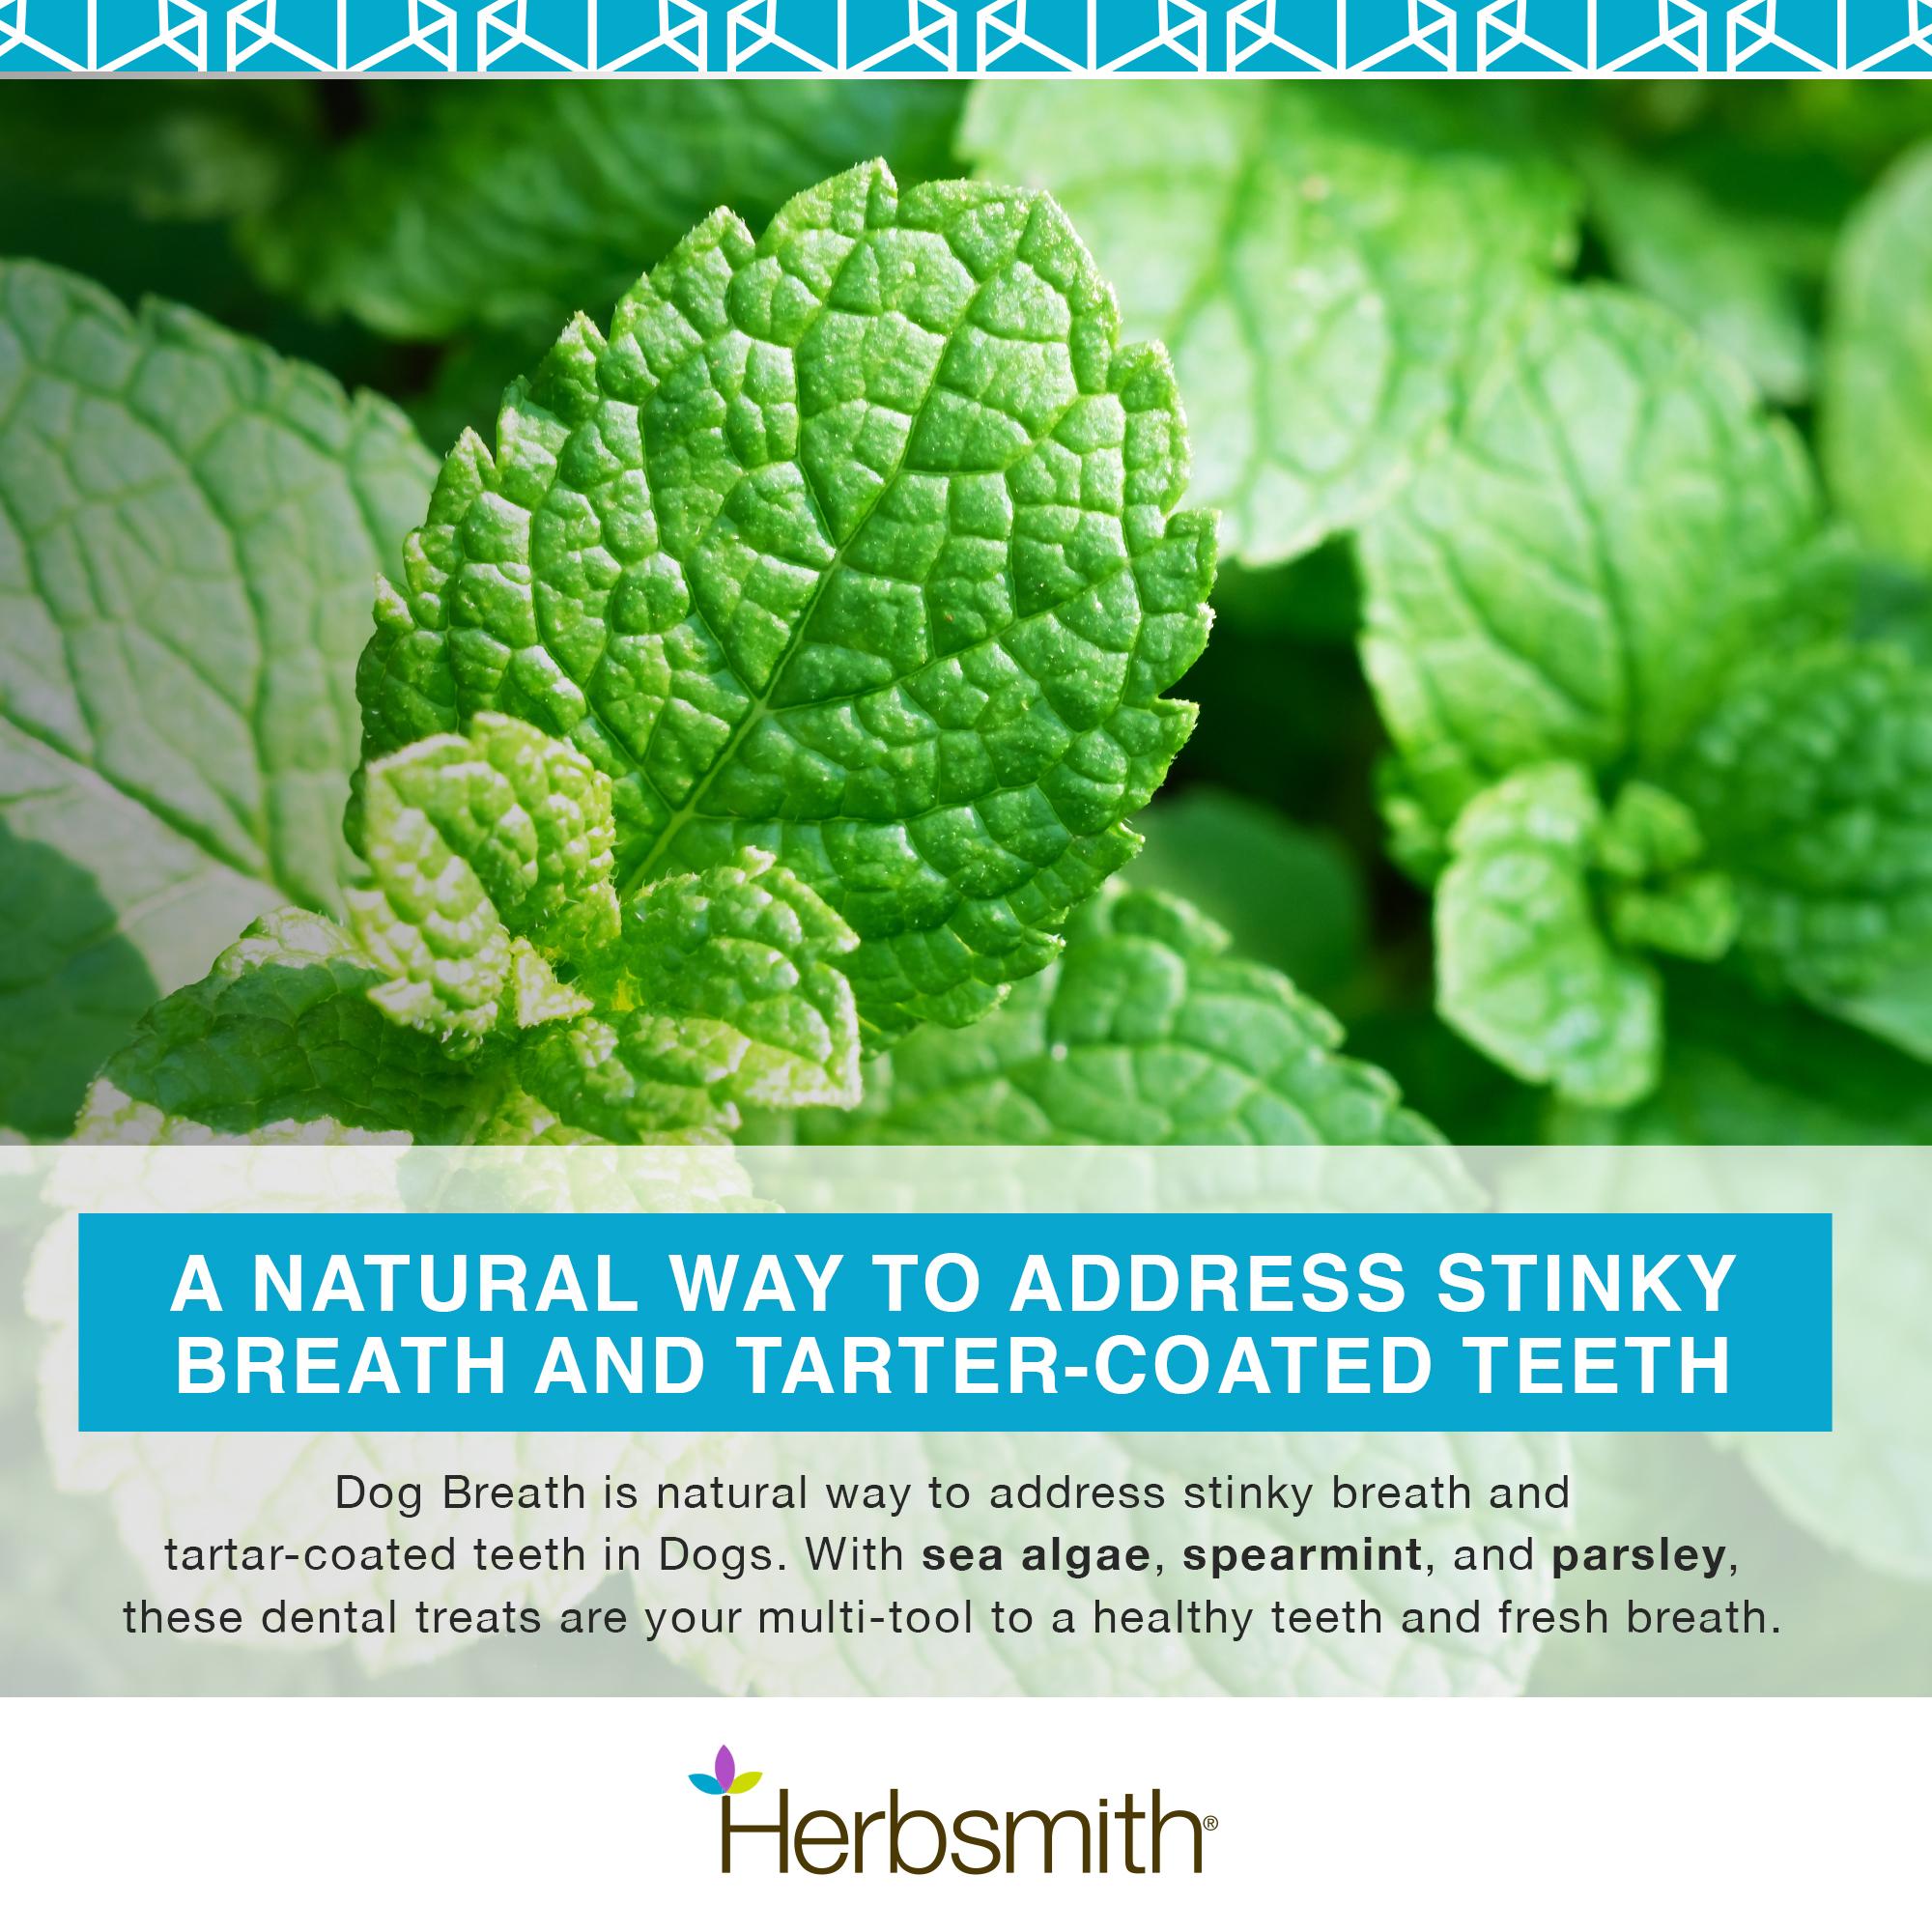 herbsmith-amazon-art-files-dog-breath-Final-ingredients